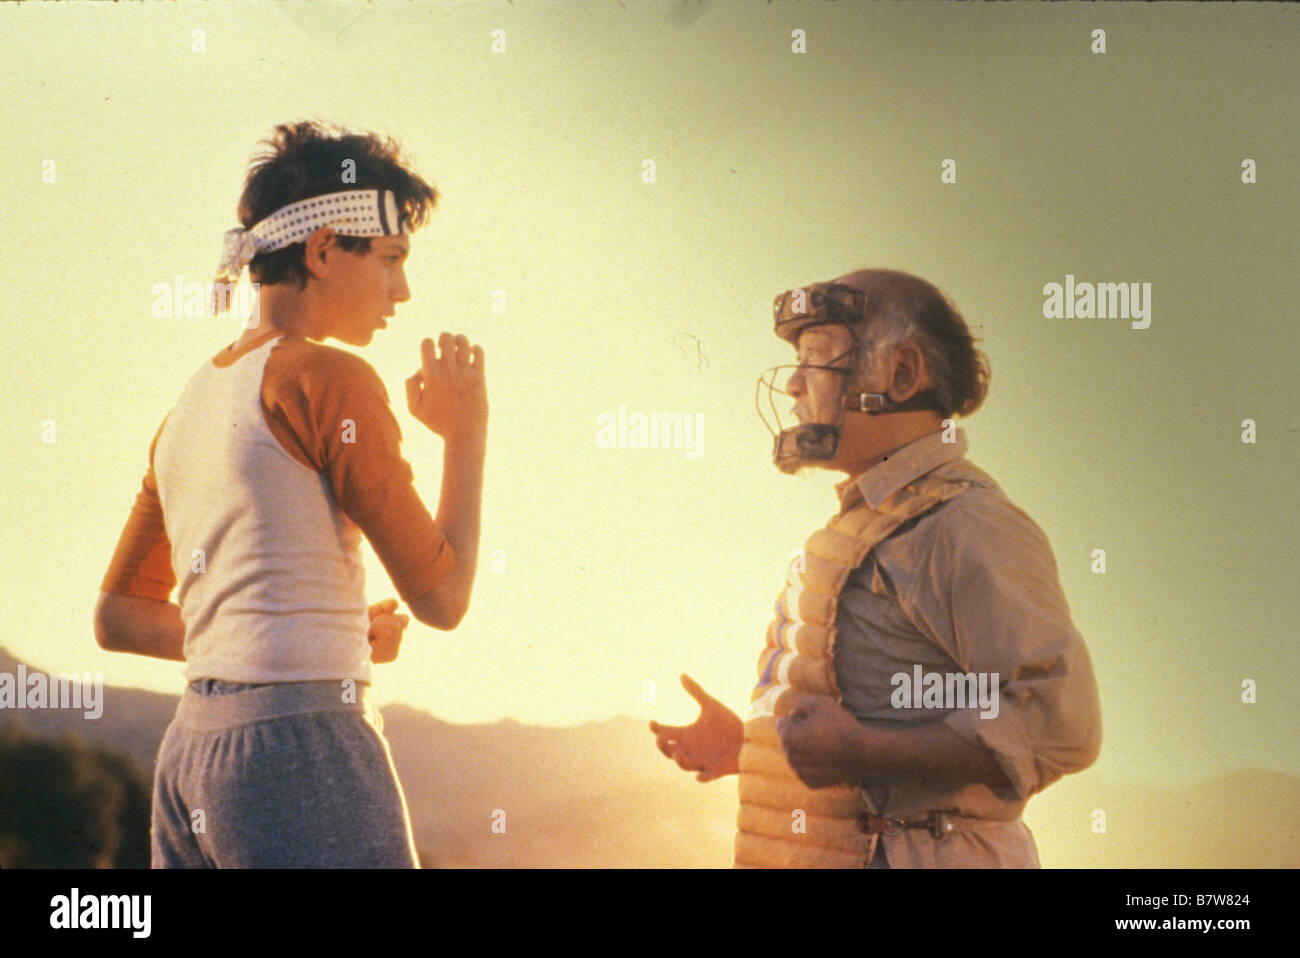 The Karate Kid Year: 1984 USA Ralph Macchio, Pat Morita  Director: John G. Avildsen - Stock Image